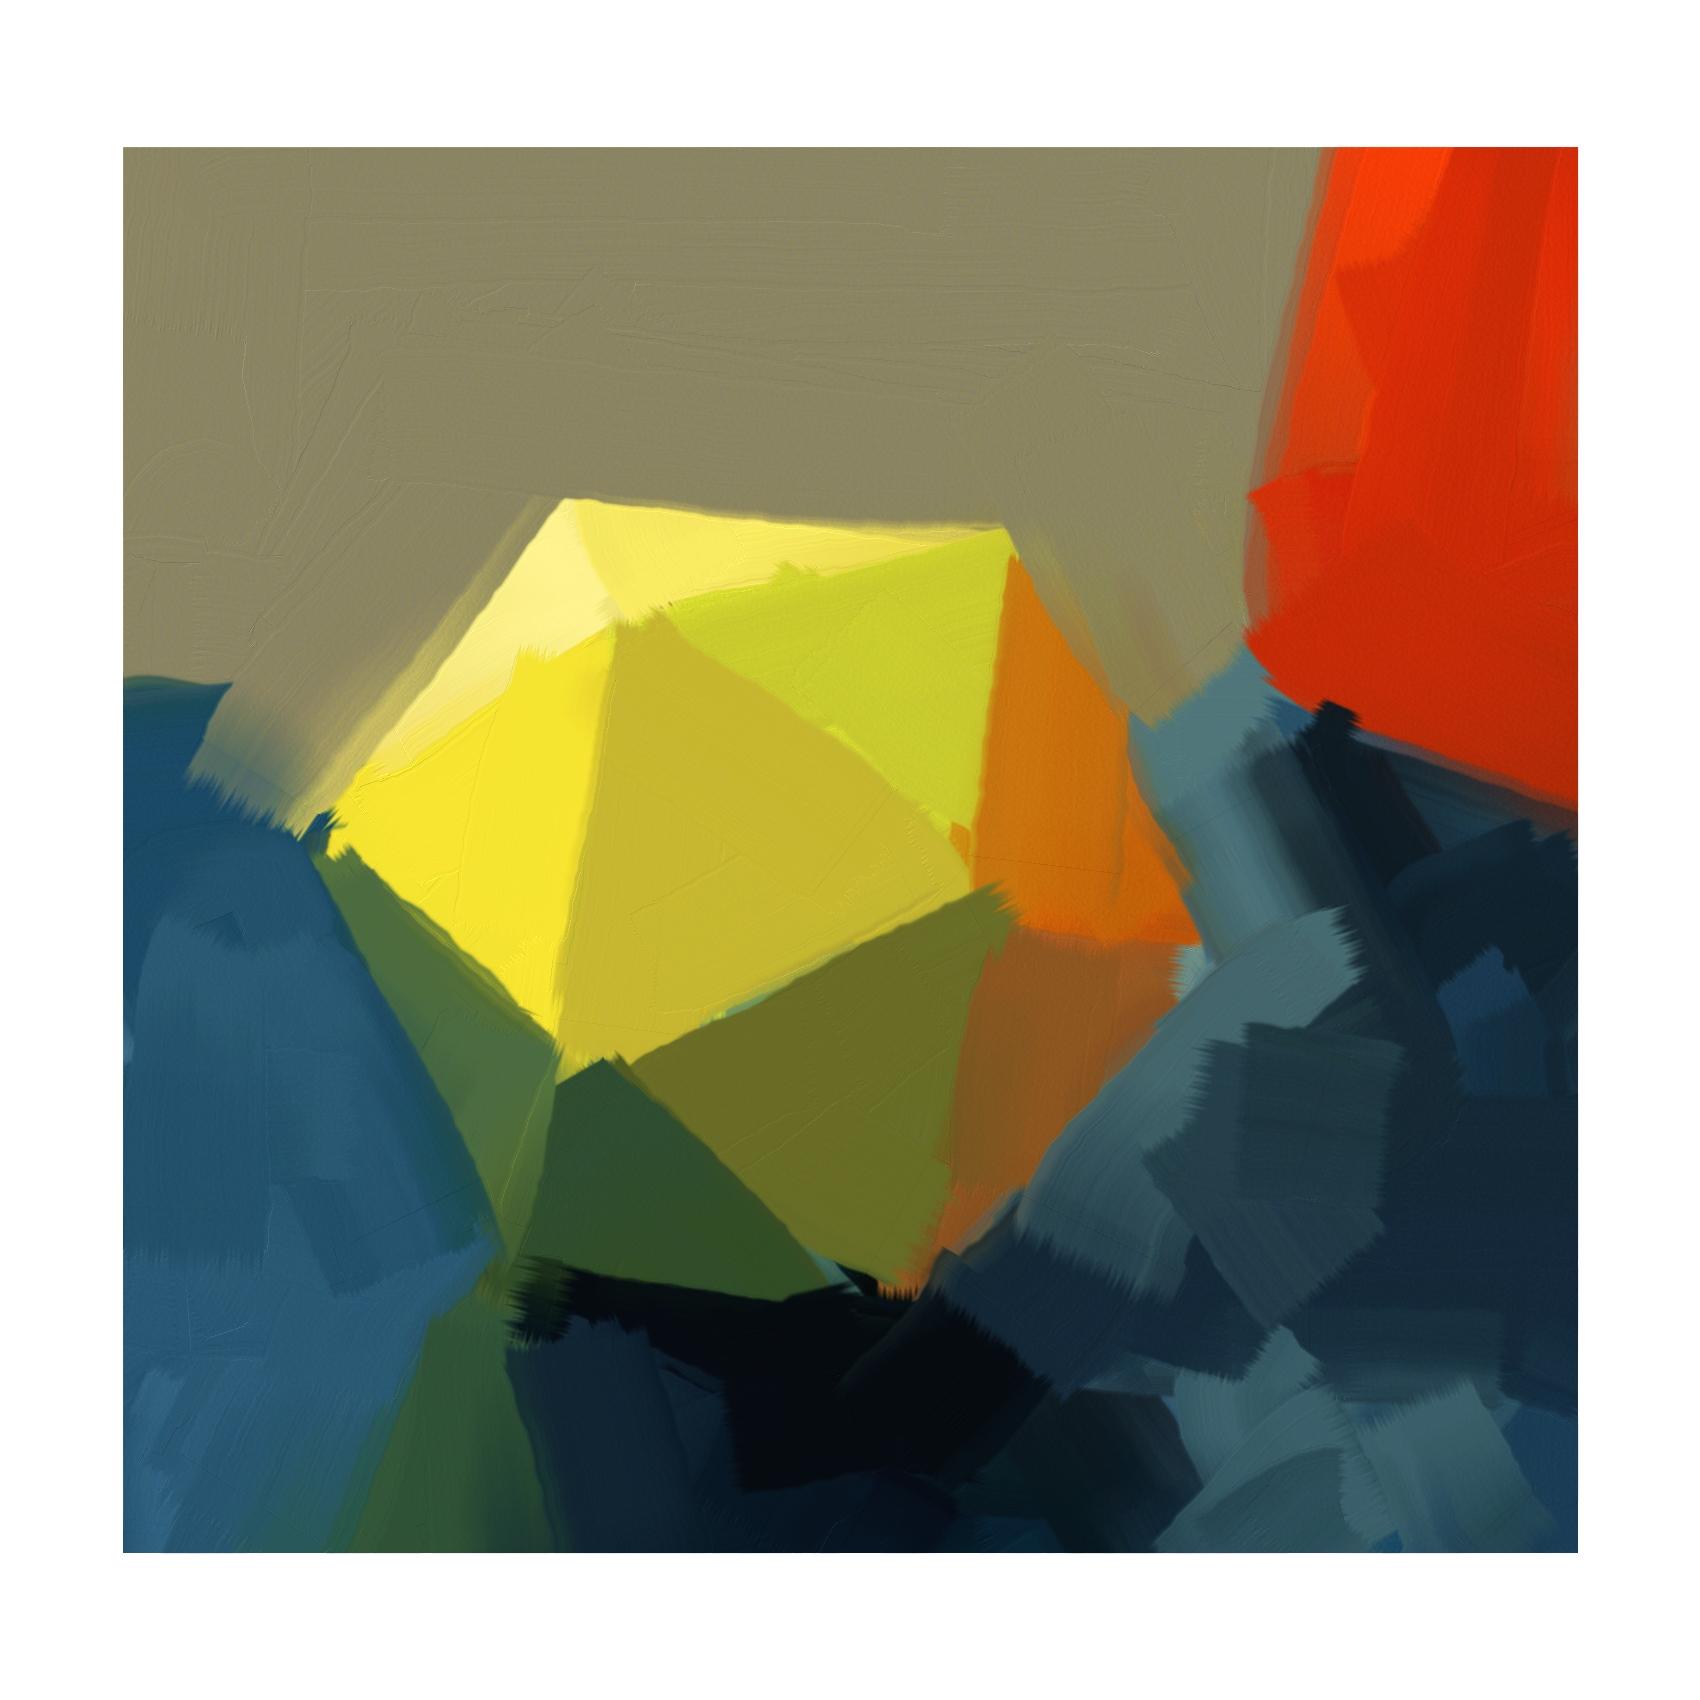 жёлтый 1 из 20.jpg